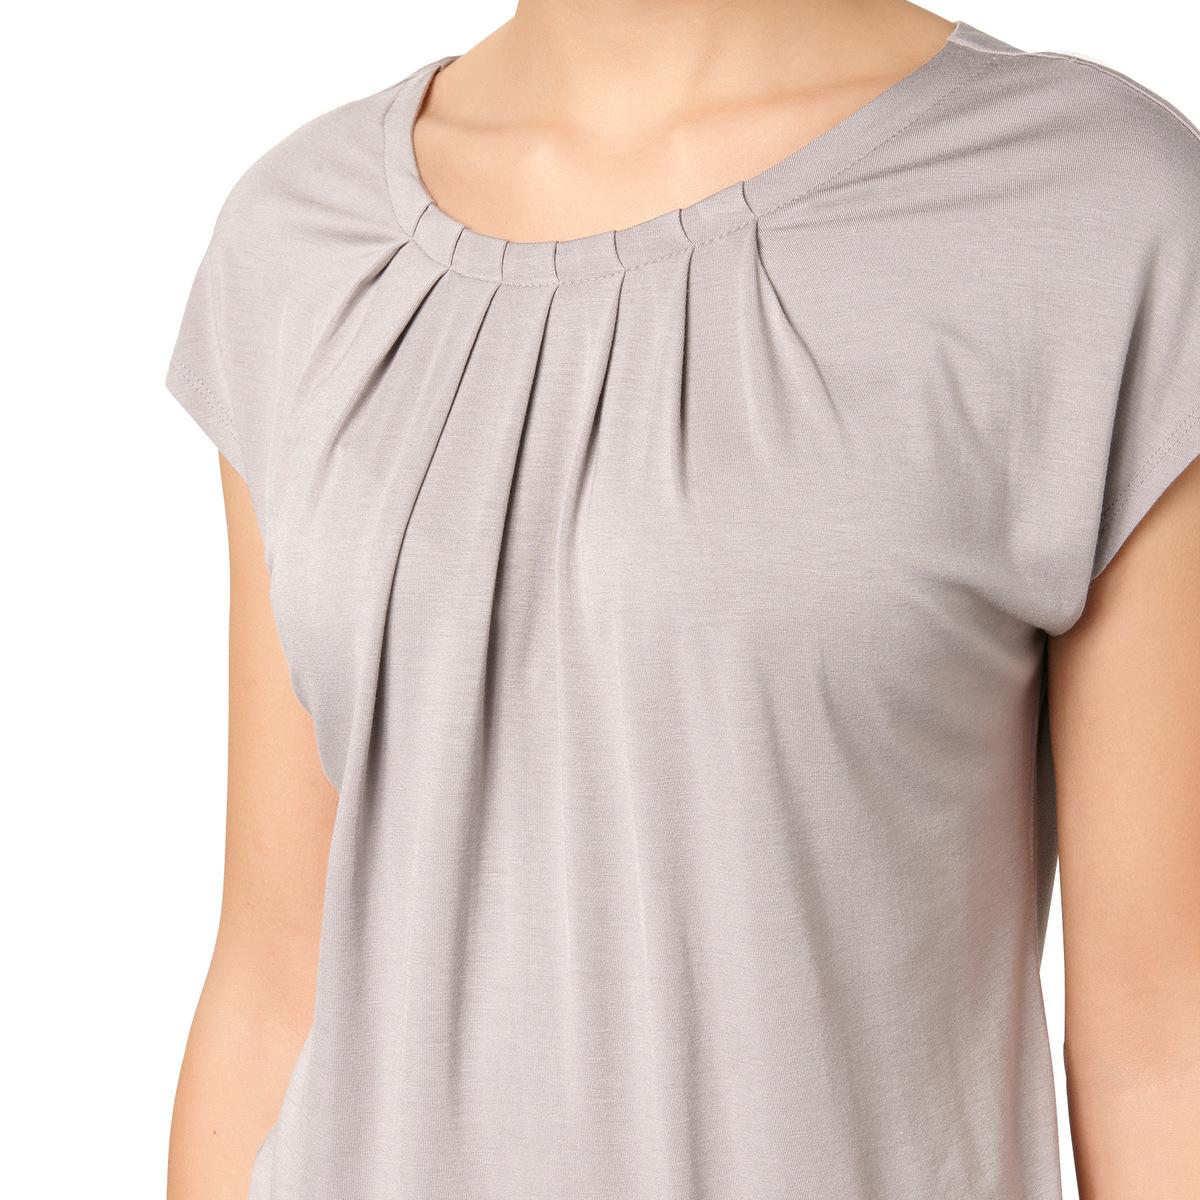 T-Shirt Rike mit frontalem Faltenwurf in sateen grey